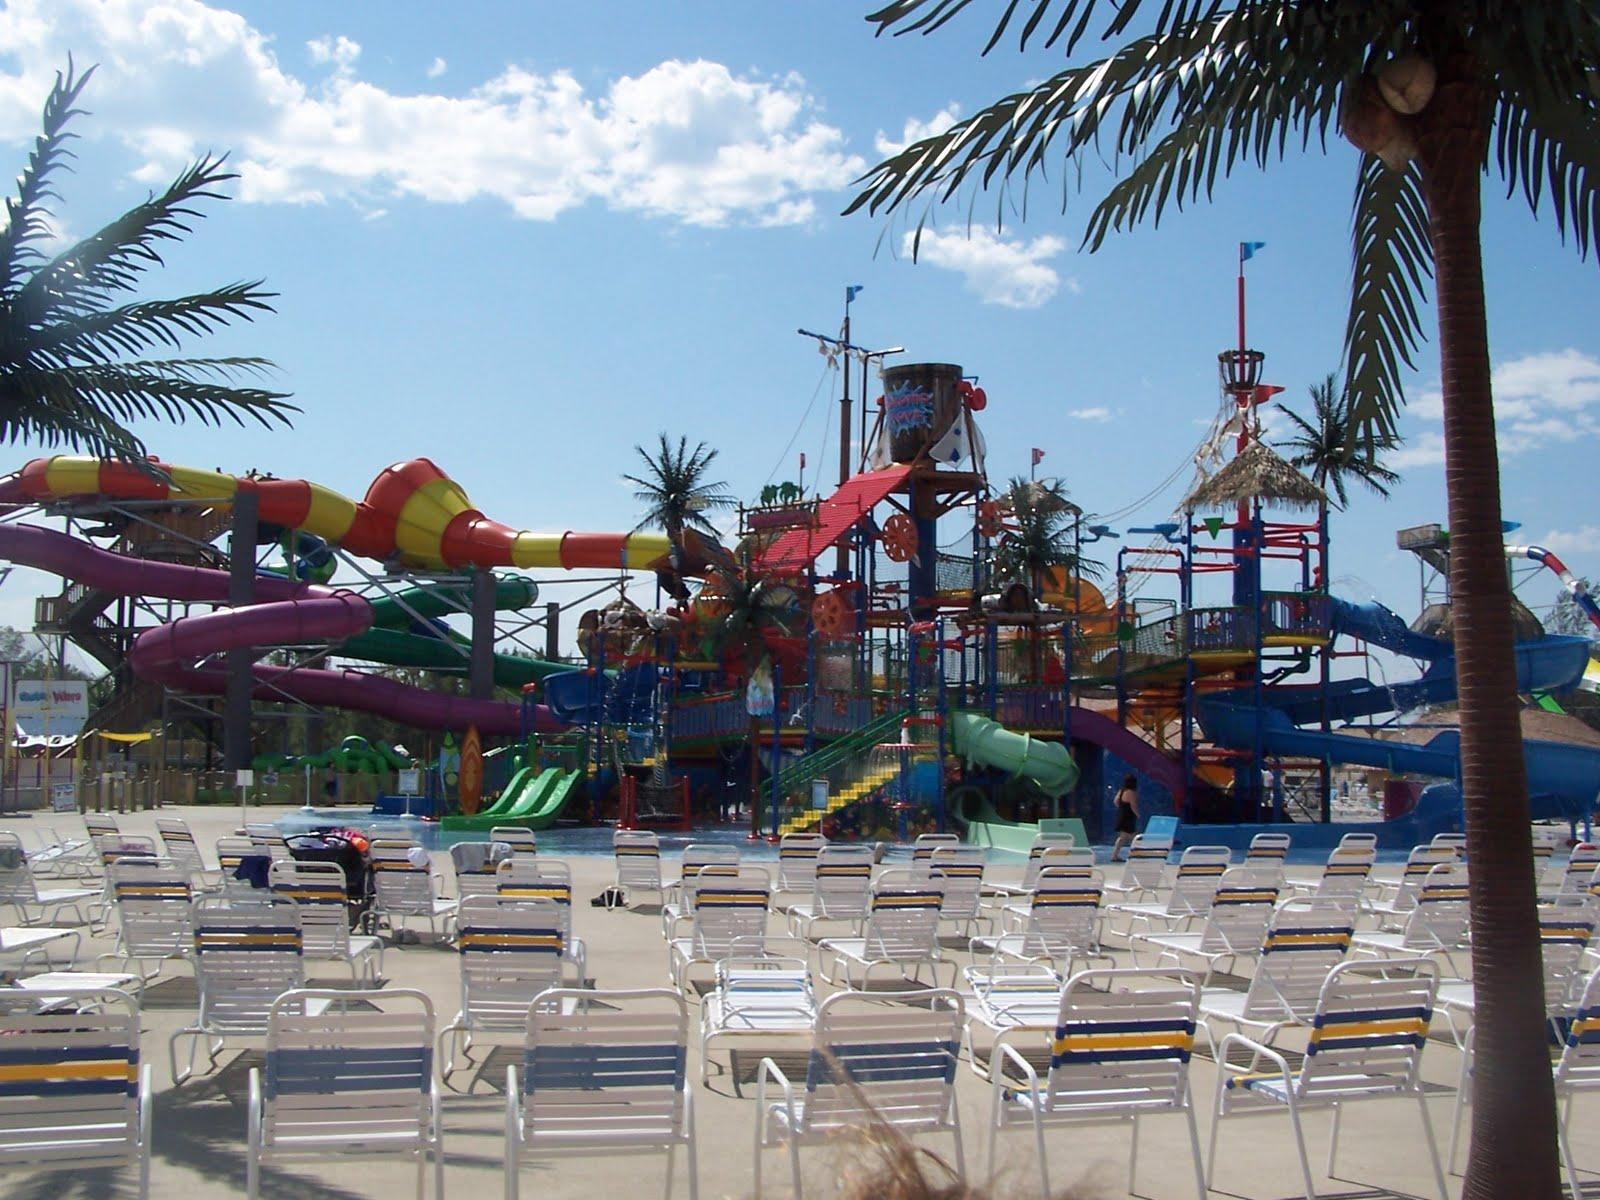 The Malone S Ultimate Fieldtrip Adventureland Park Resort